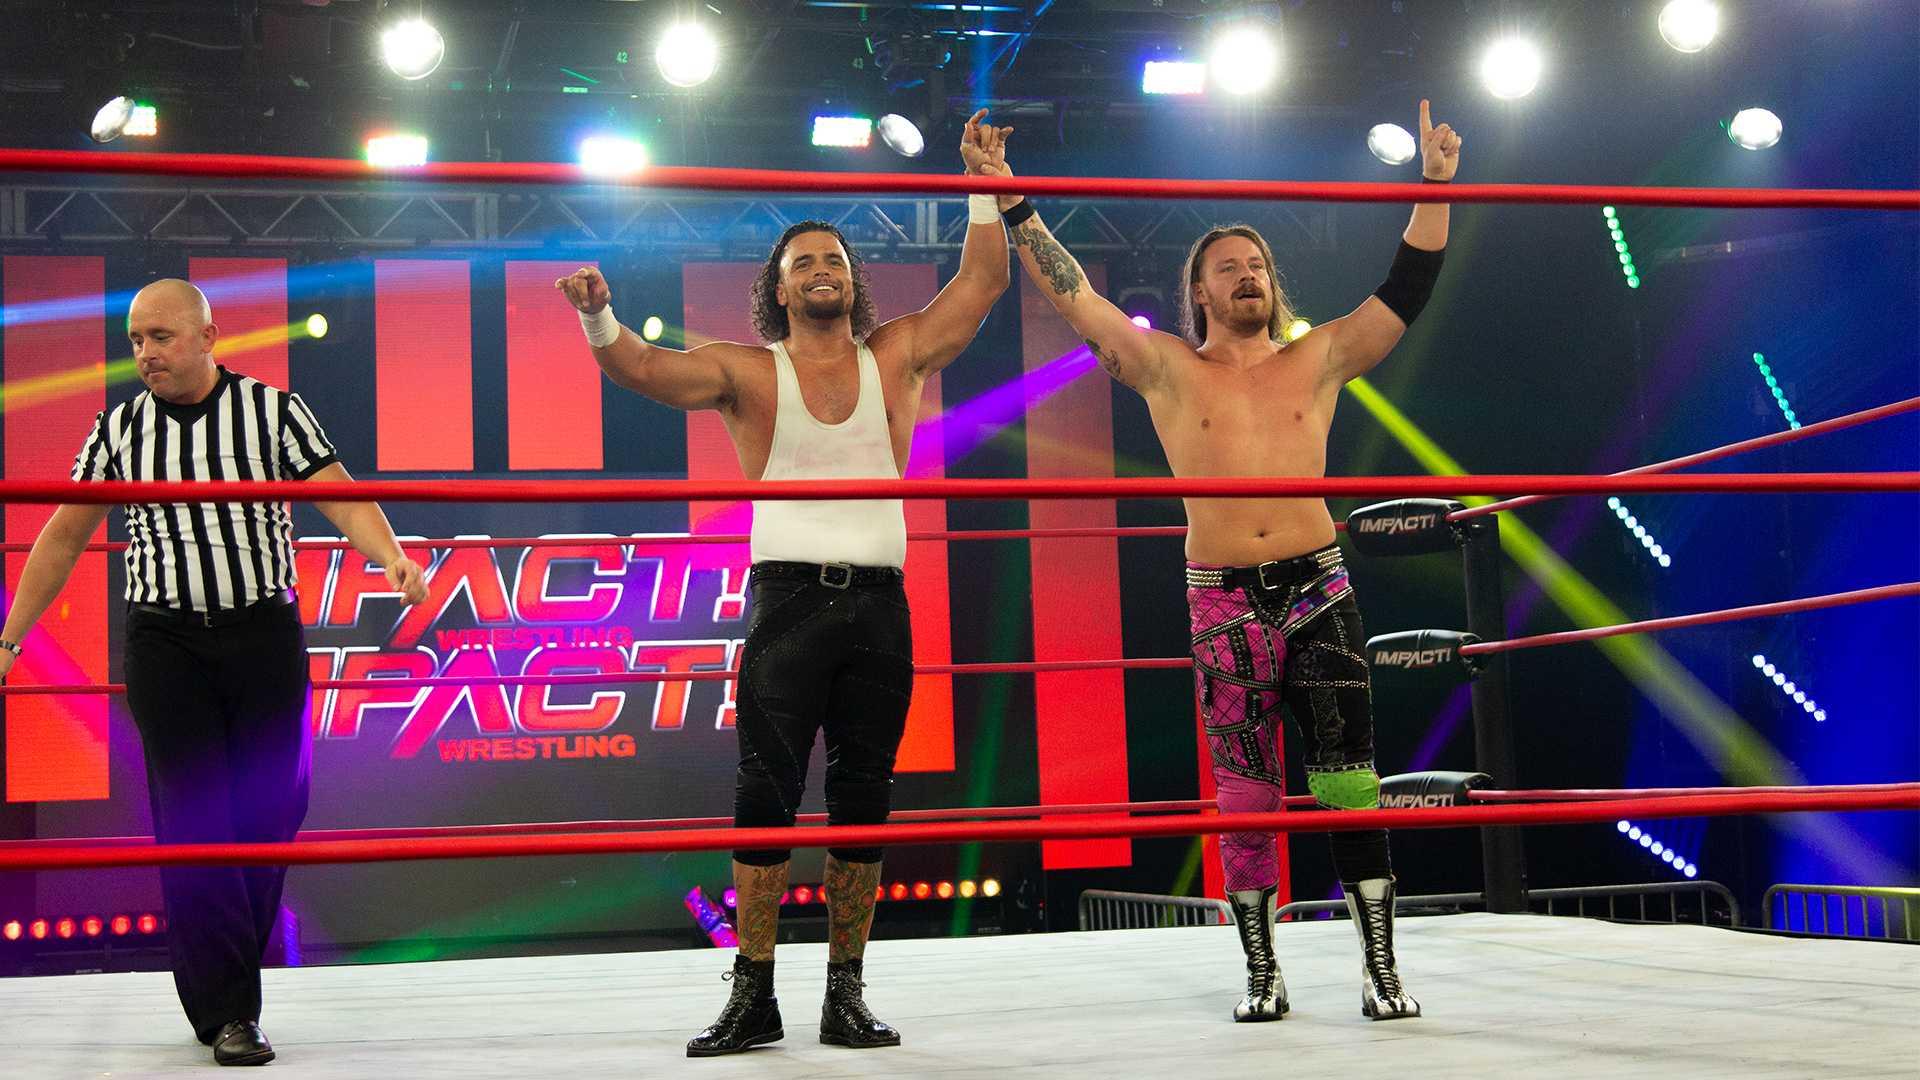 finjuice impact wrestling compressed